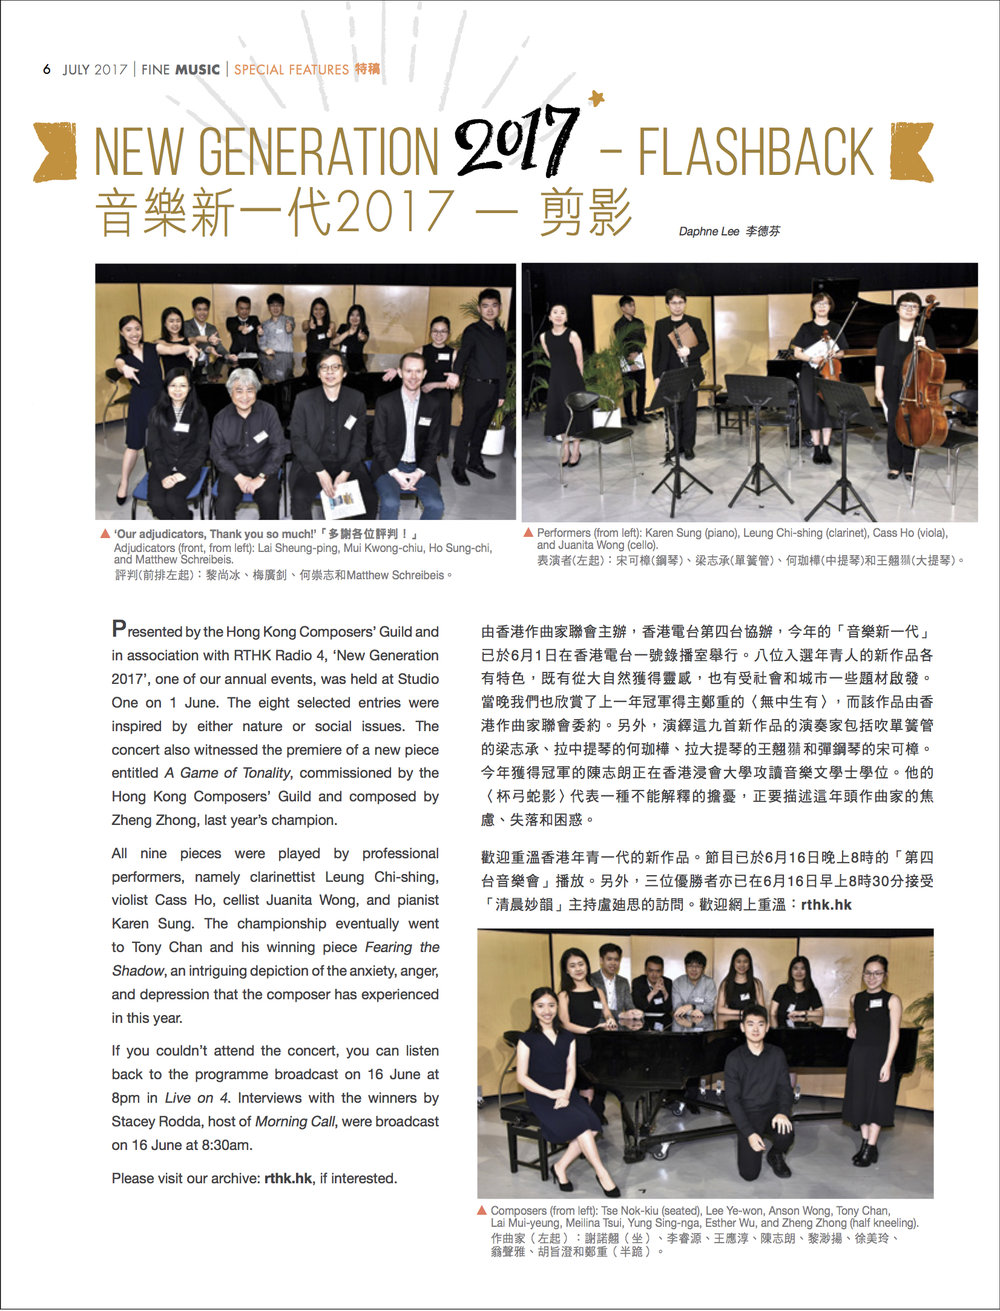 FM.HKCG.1.jpg